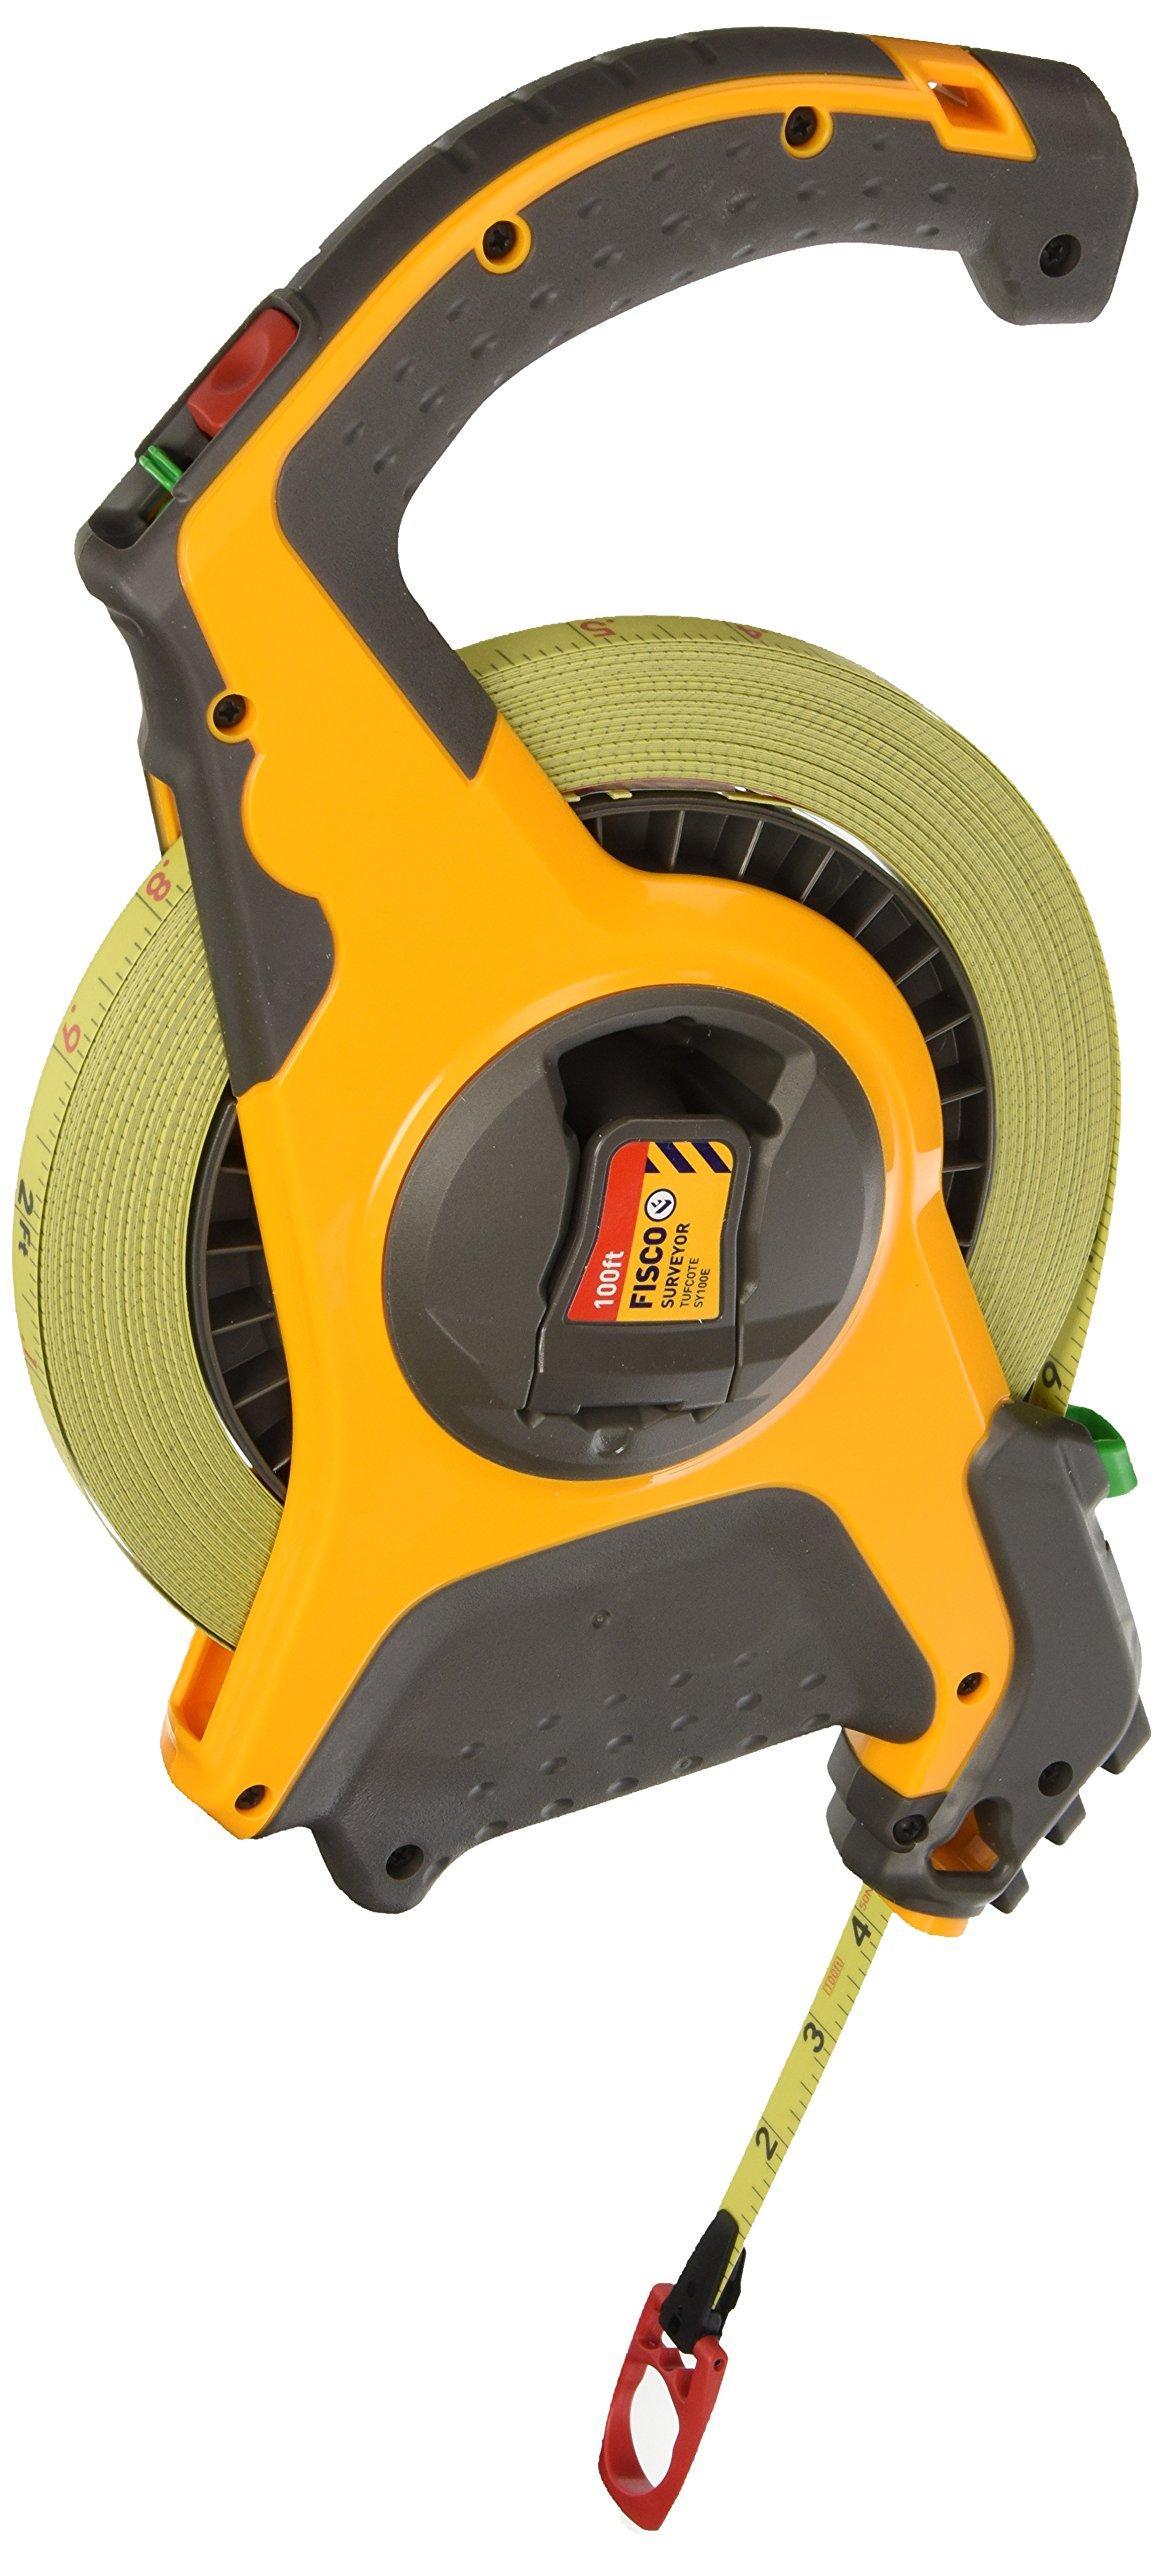 Fisco Tools SY100E Surveyor-Feets Steel Long Tape, 1/2-Inch by 100-Feet